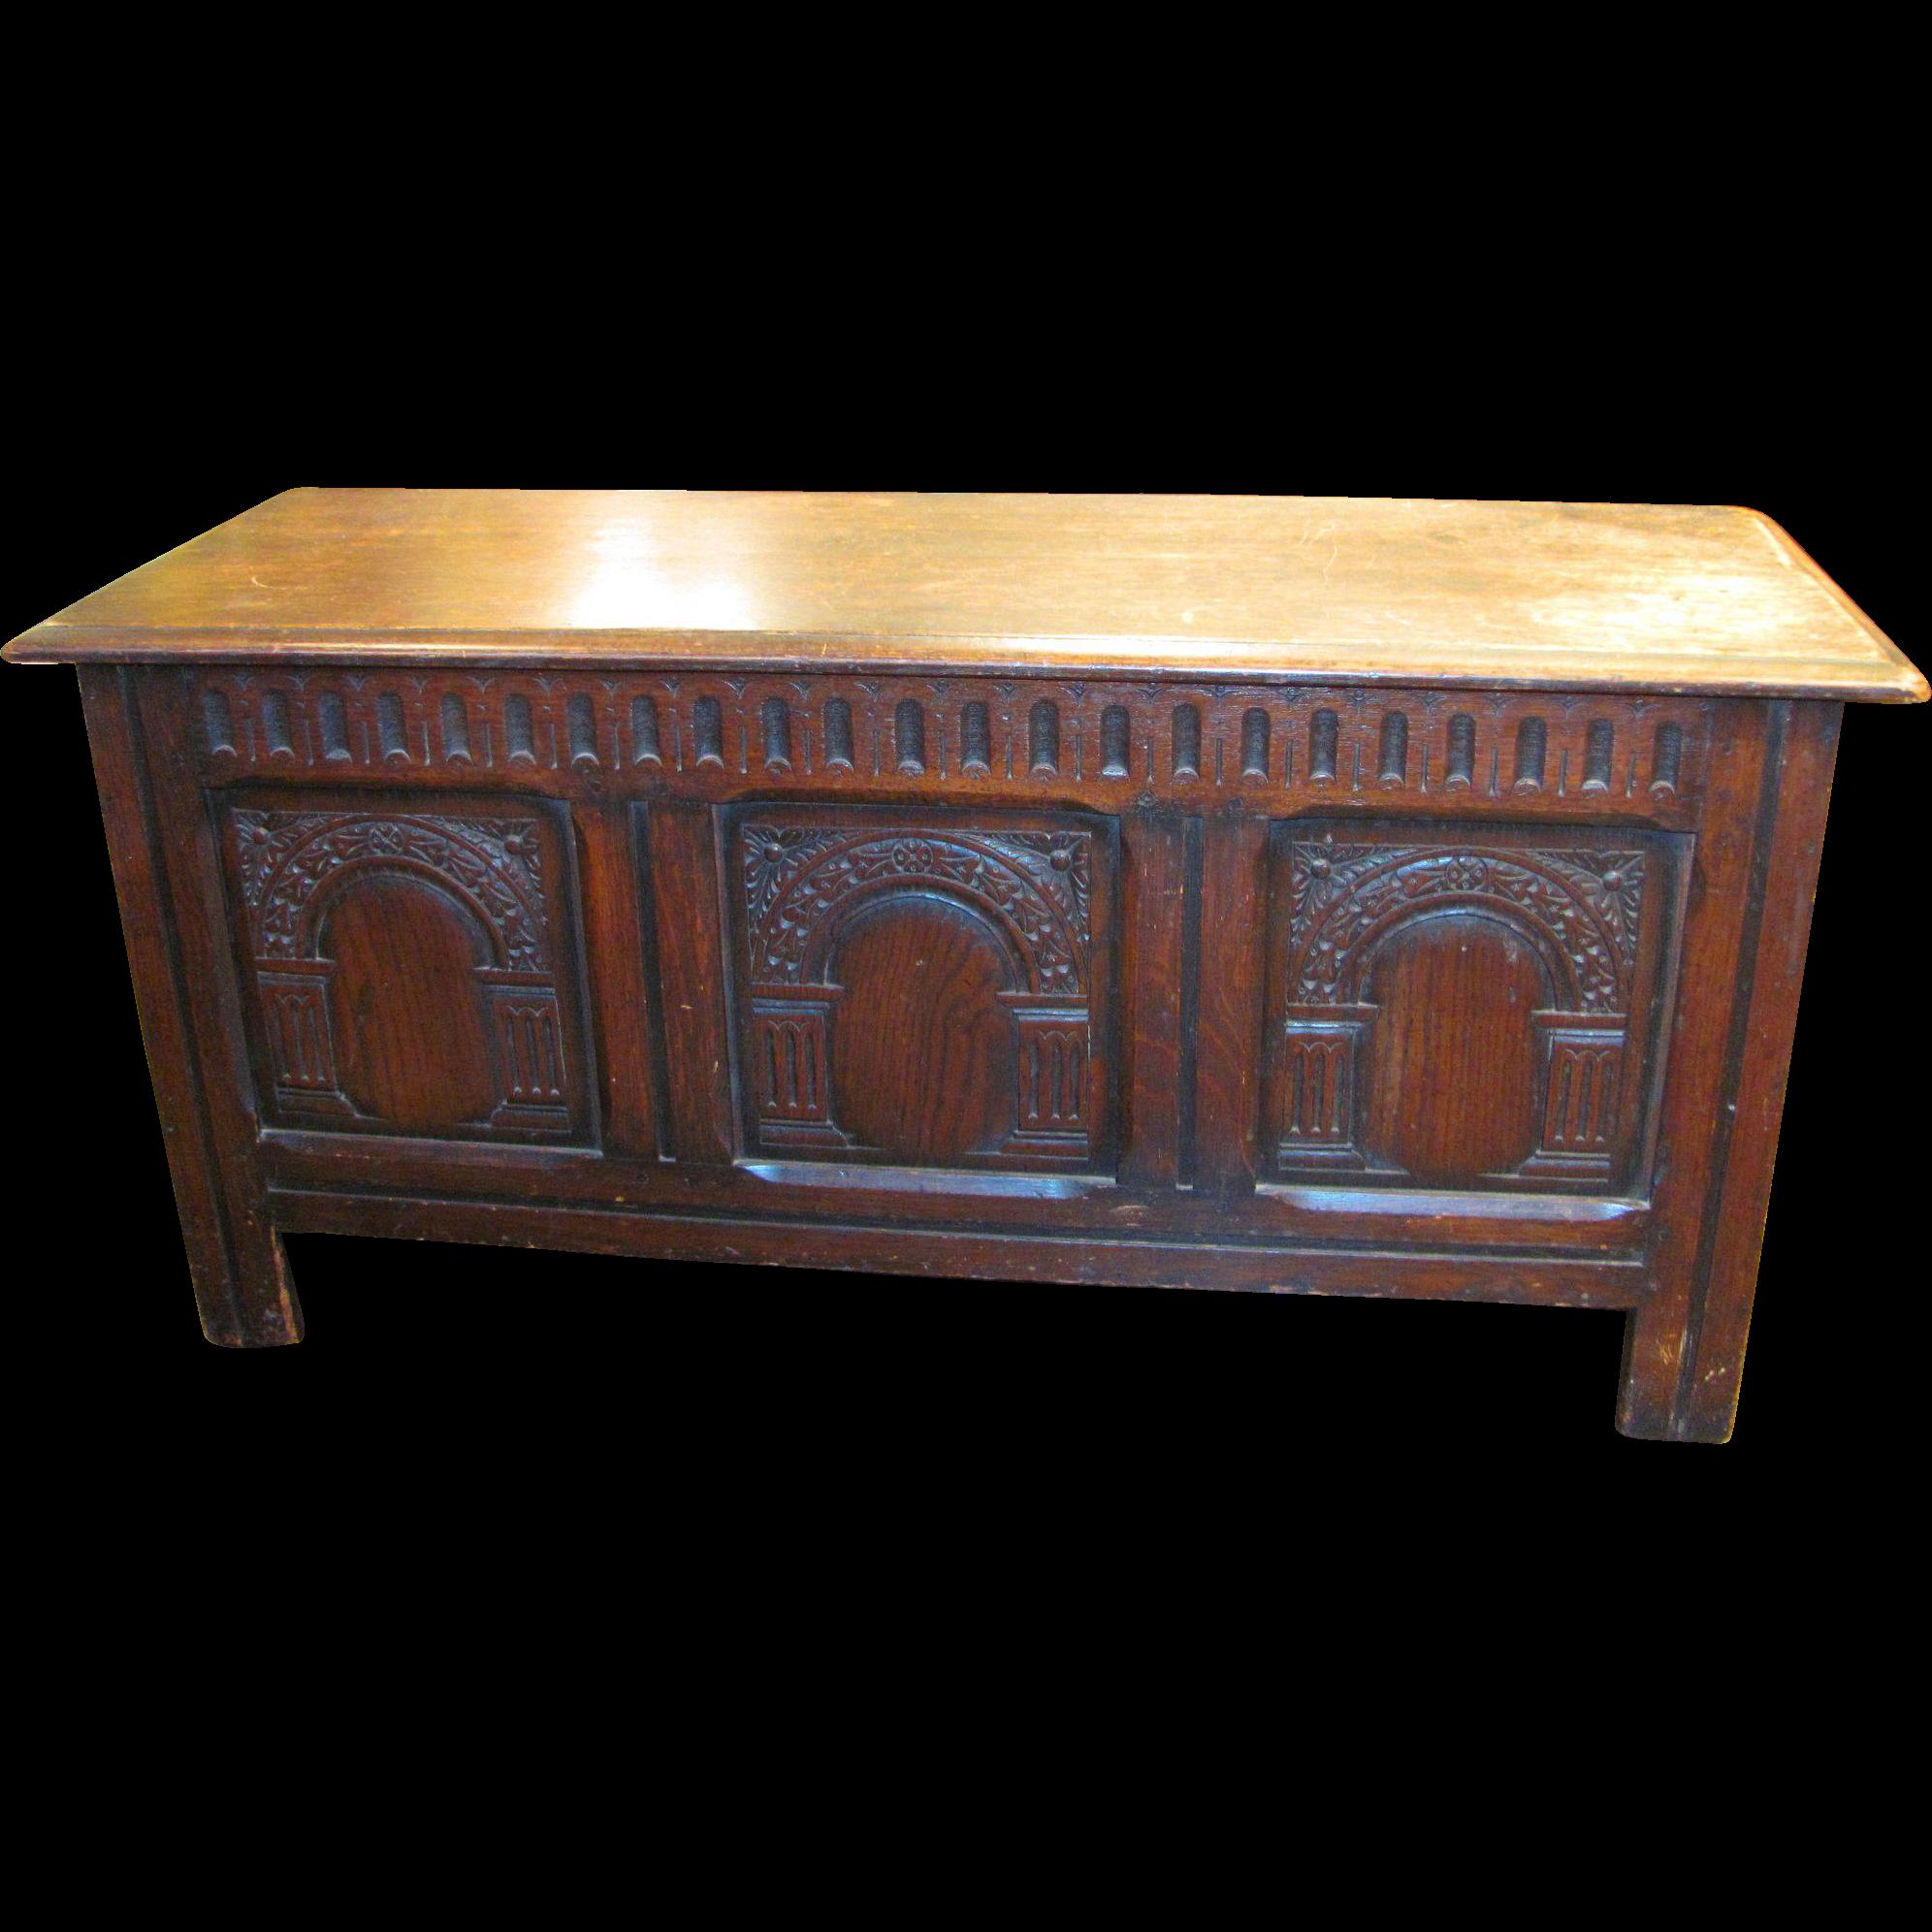 Antique English Oak Jacobean Style Coffer Circa 1880